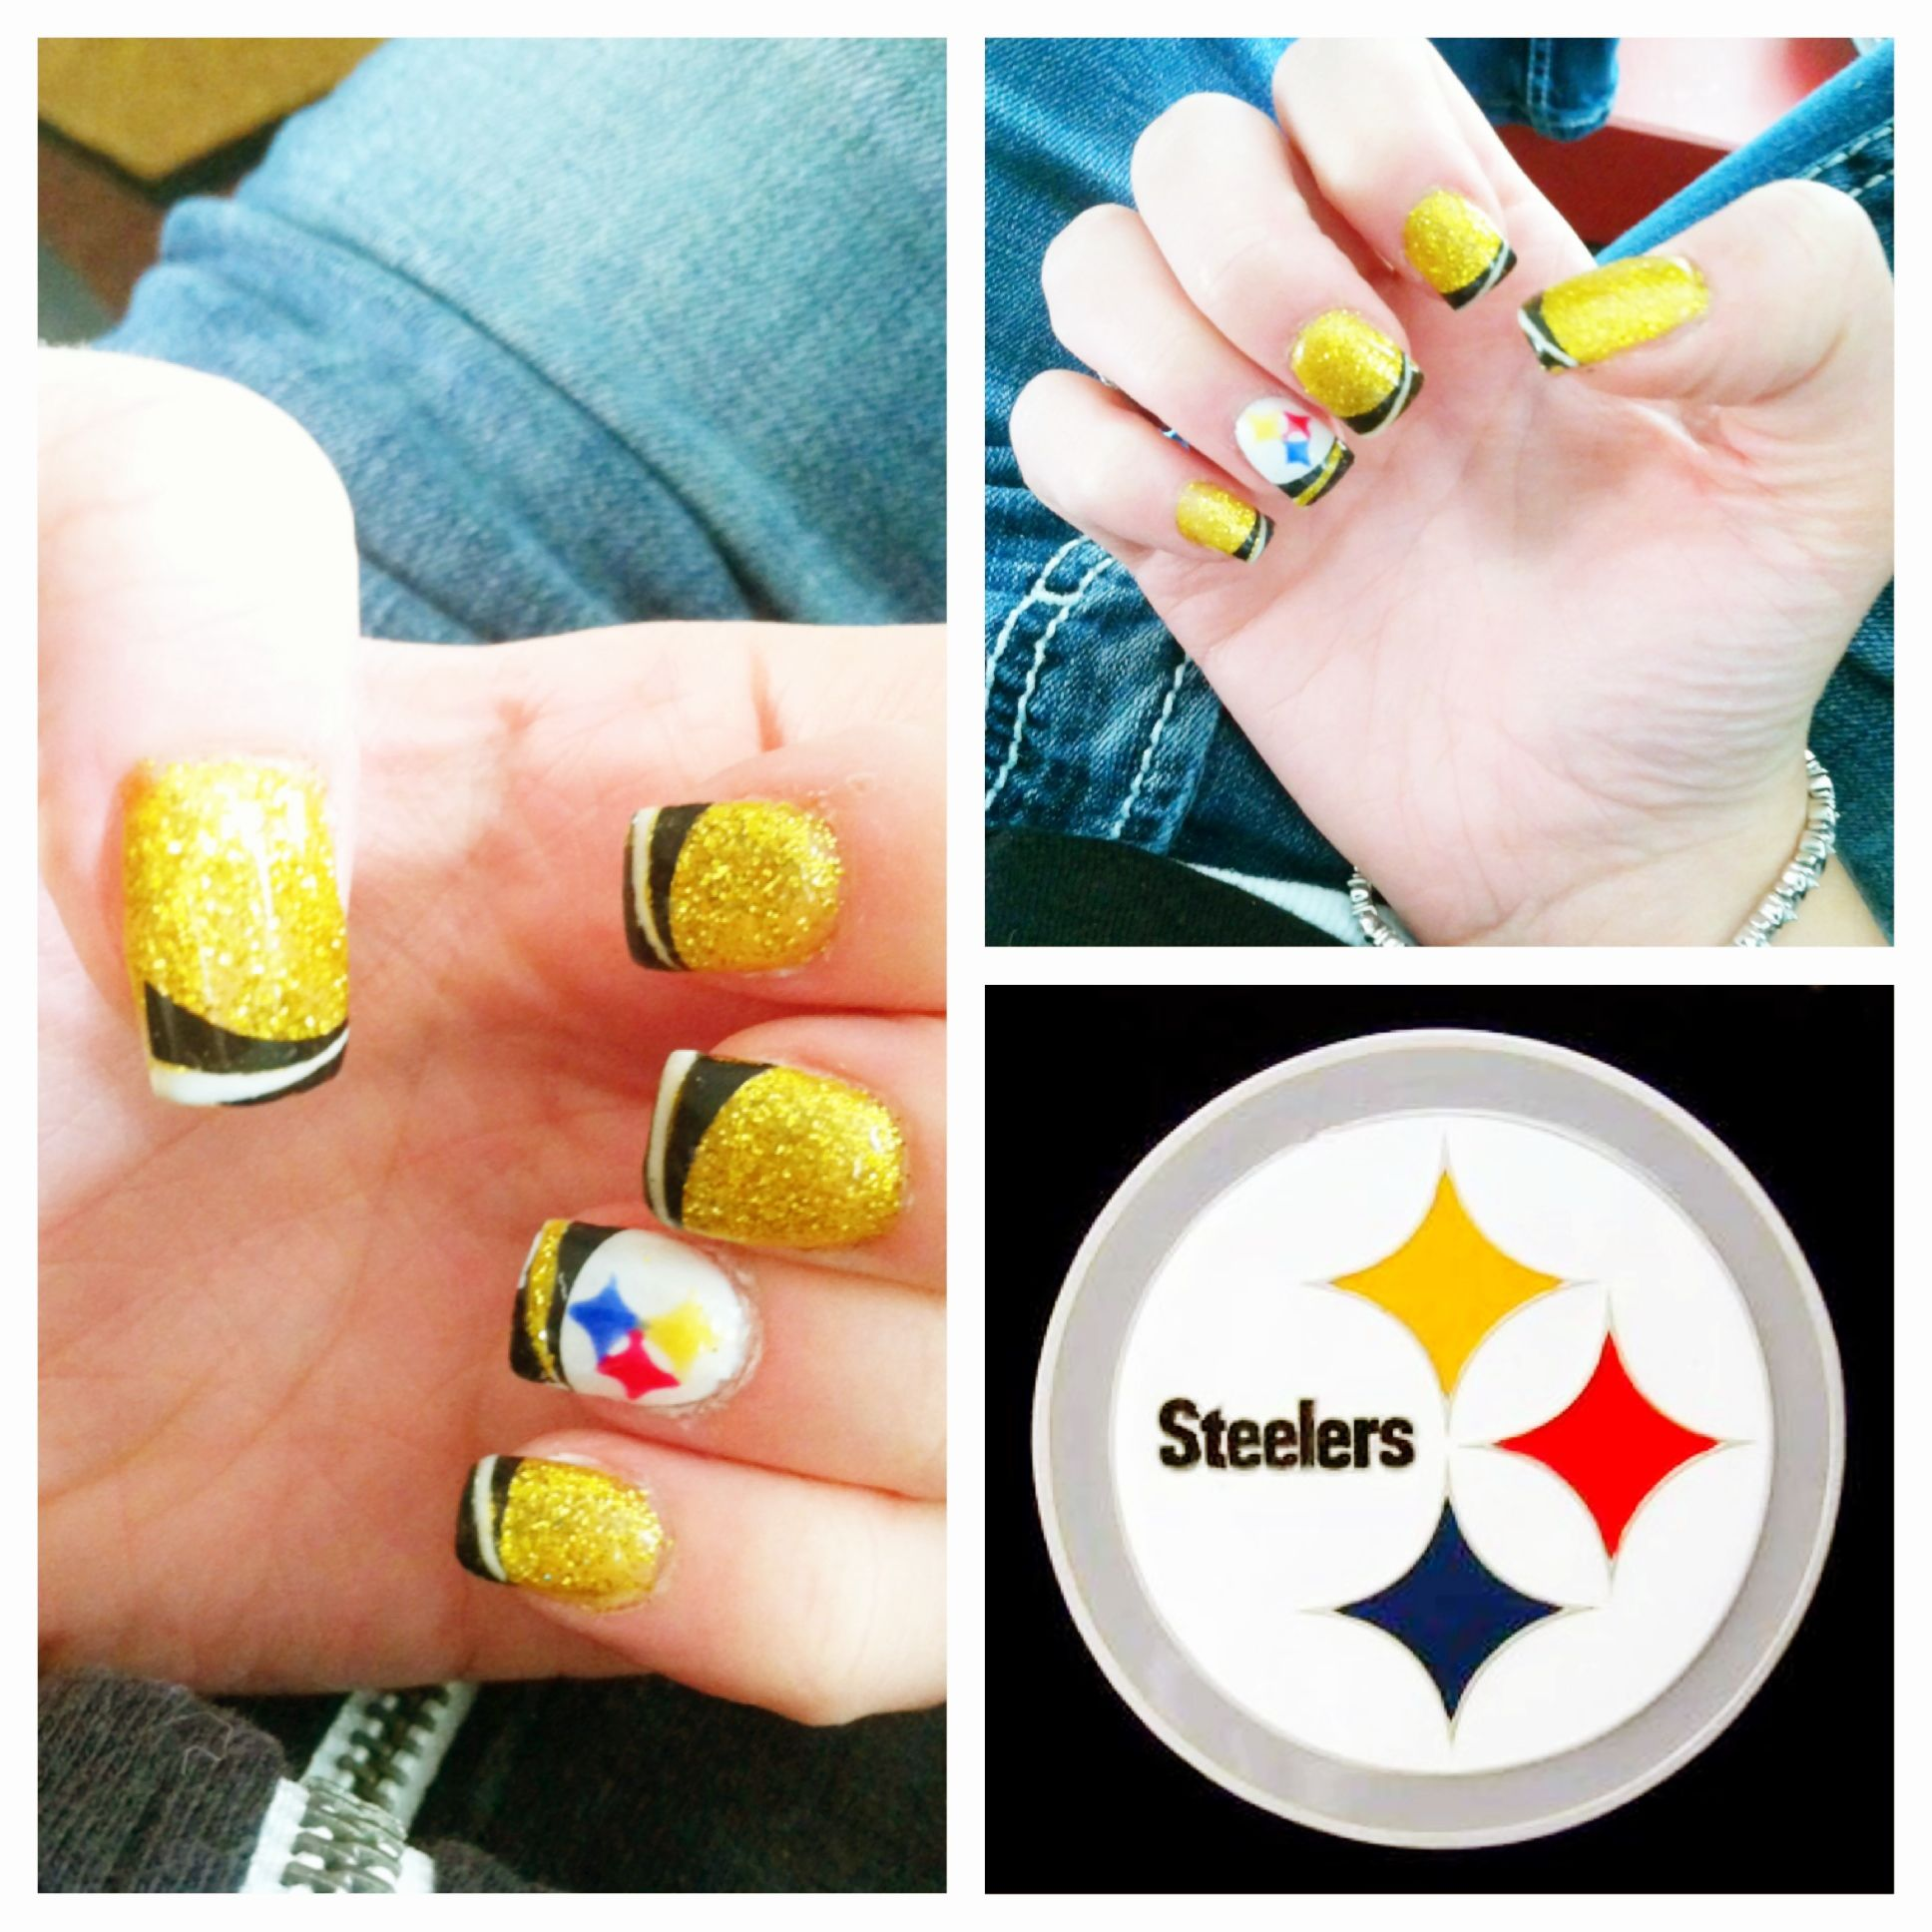 Steeler nation football nails pittsburgh steelers montana cute sports nail art prinsesfo Choice Image